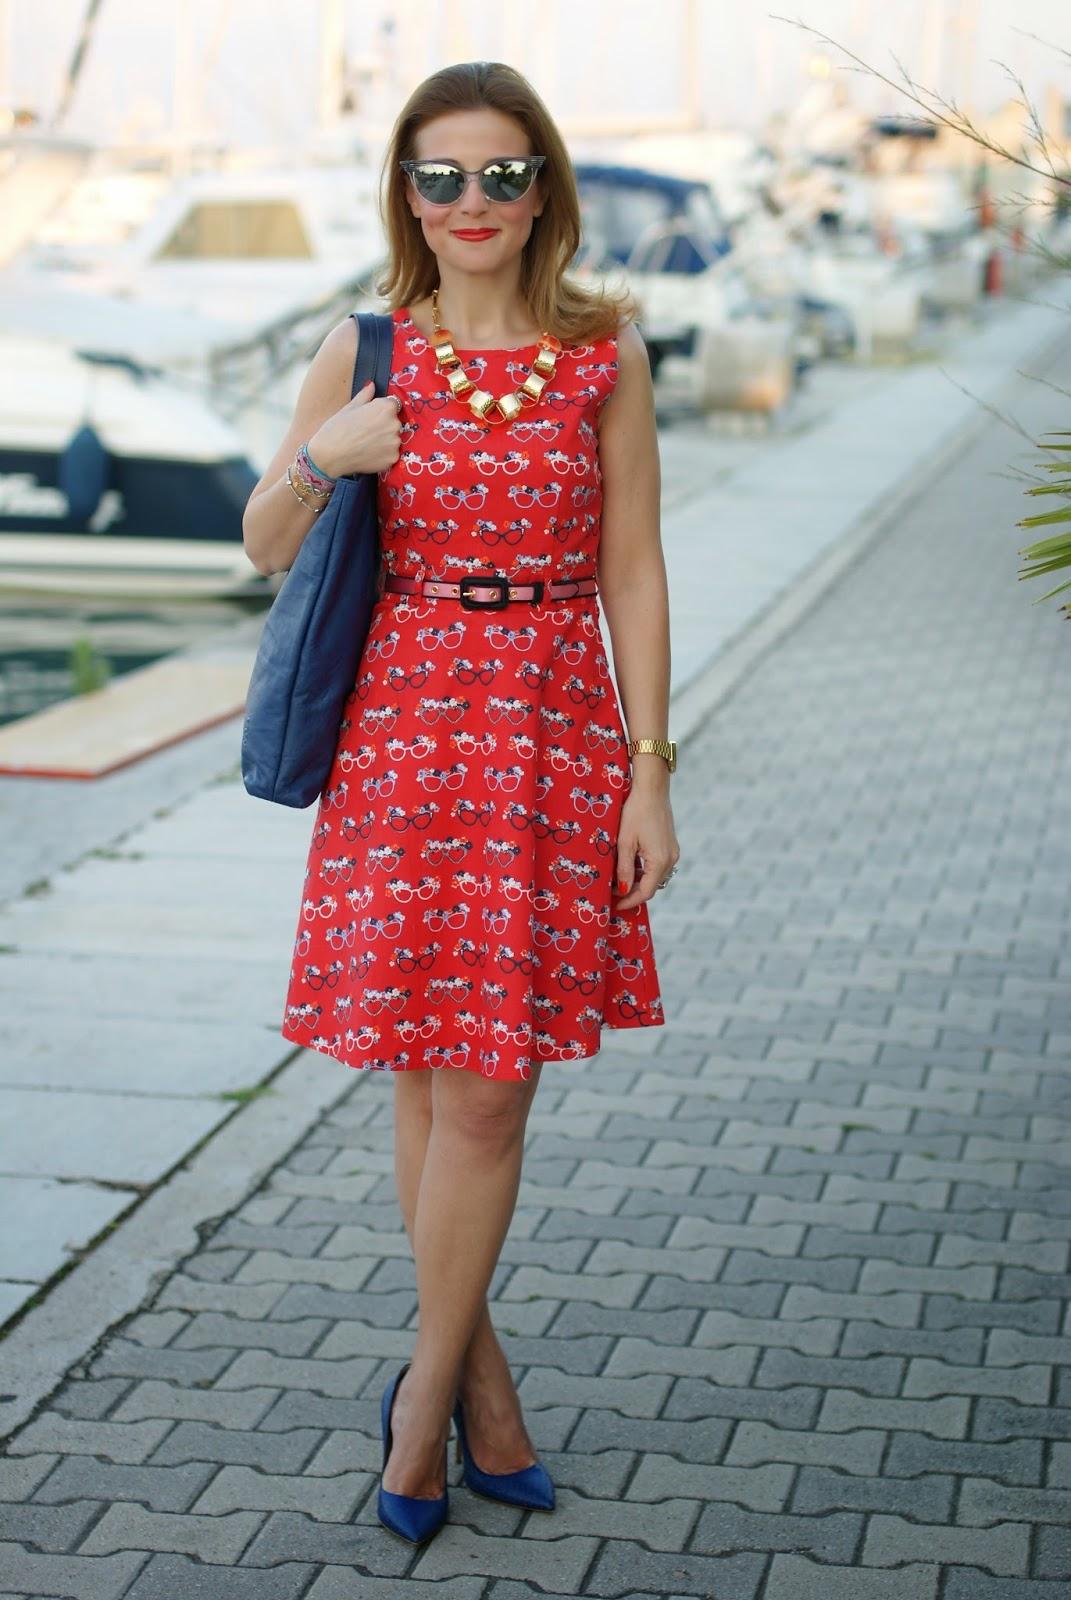 glasses print dress, sergio levantesi shoes, vitti ferria contin necklace, Fashion and Cookies, fashion blogger